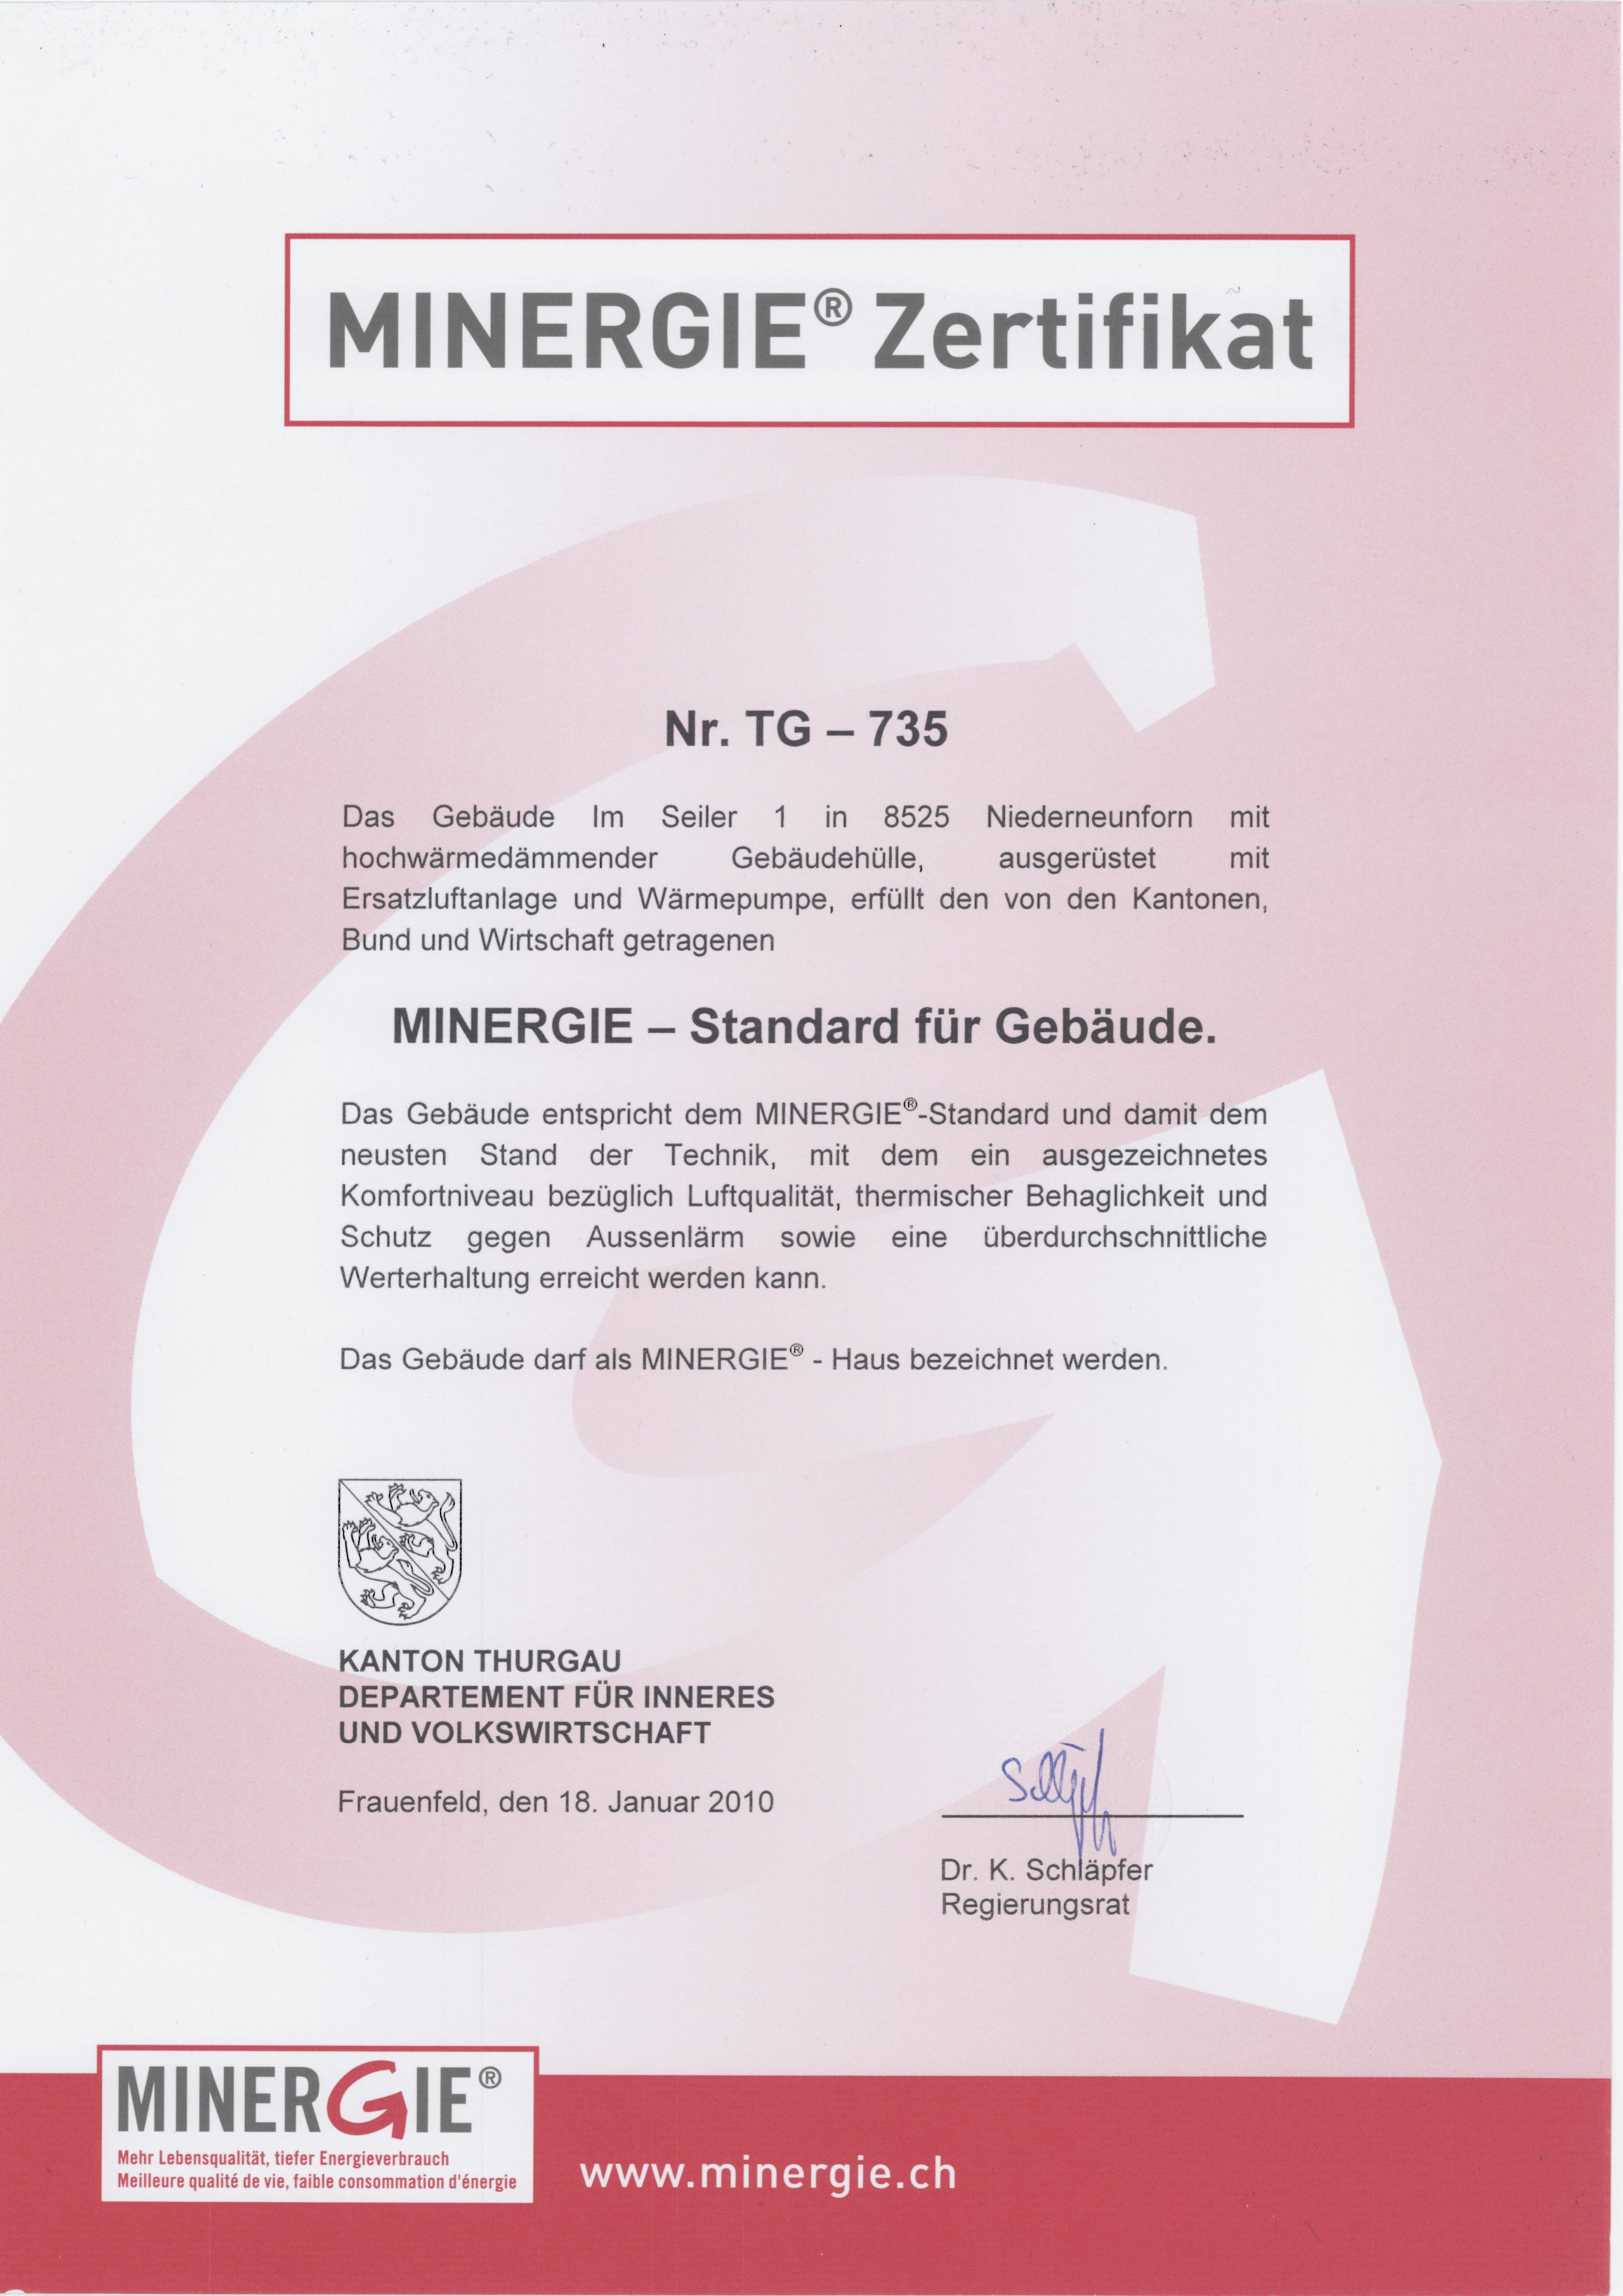 Minergie-Zertifikat